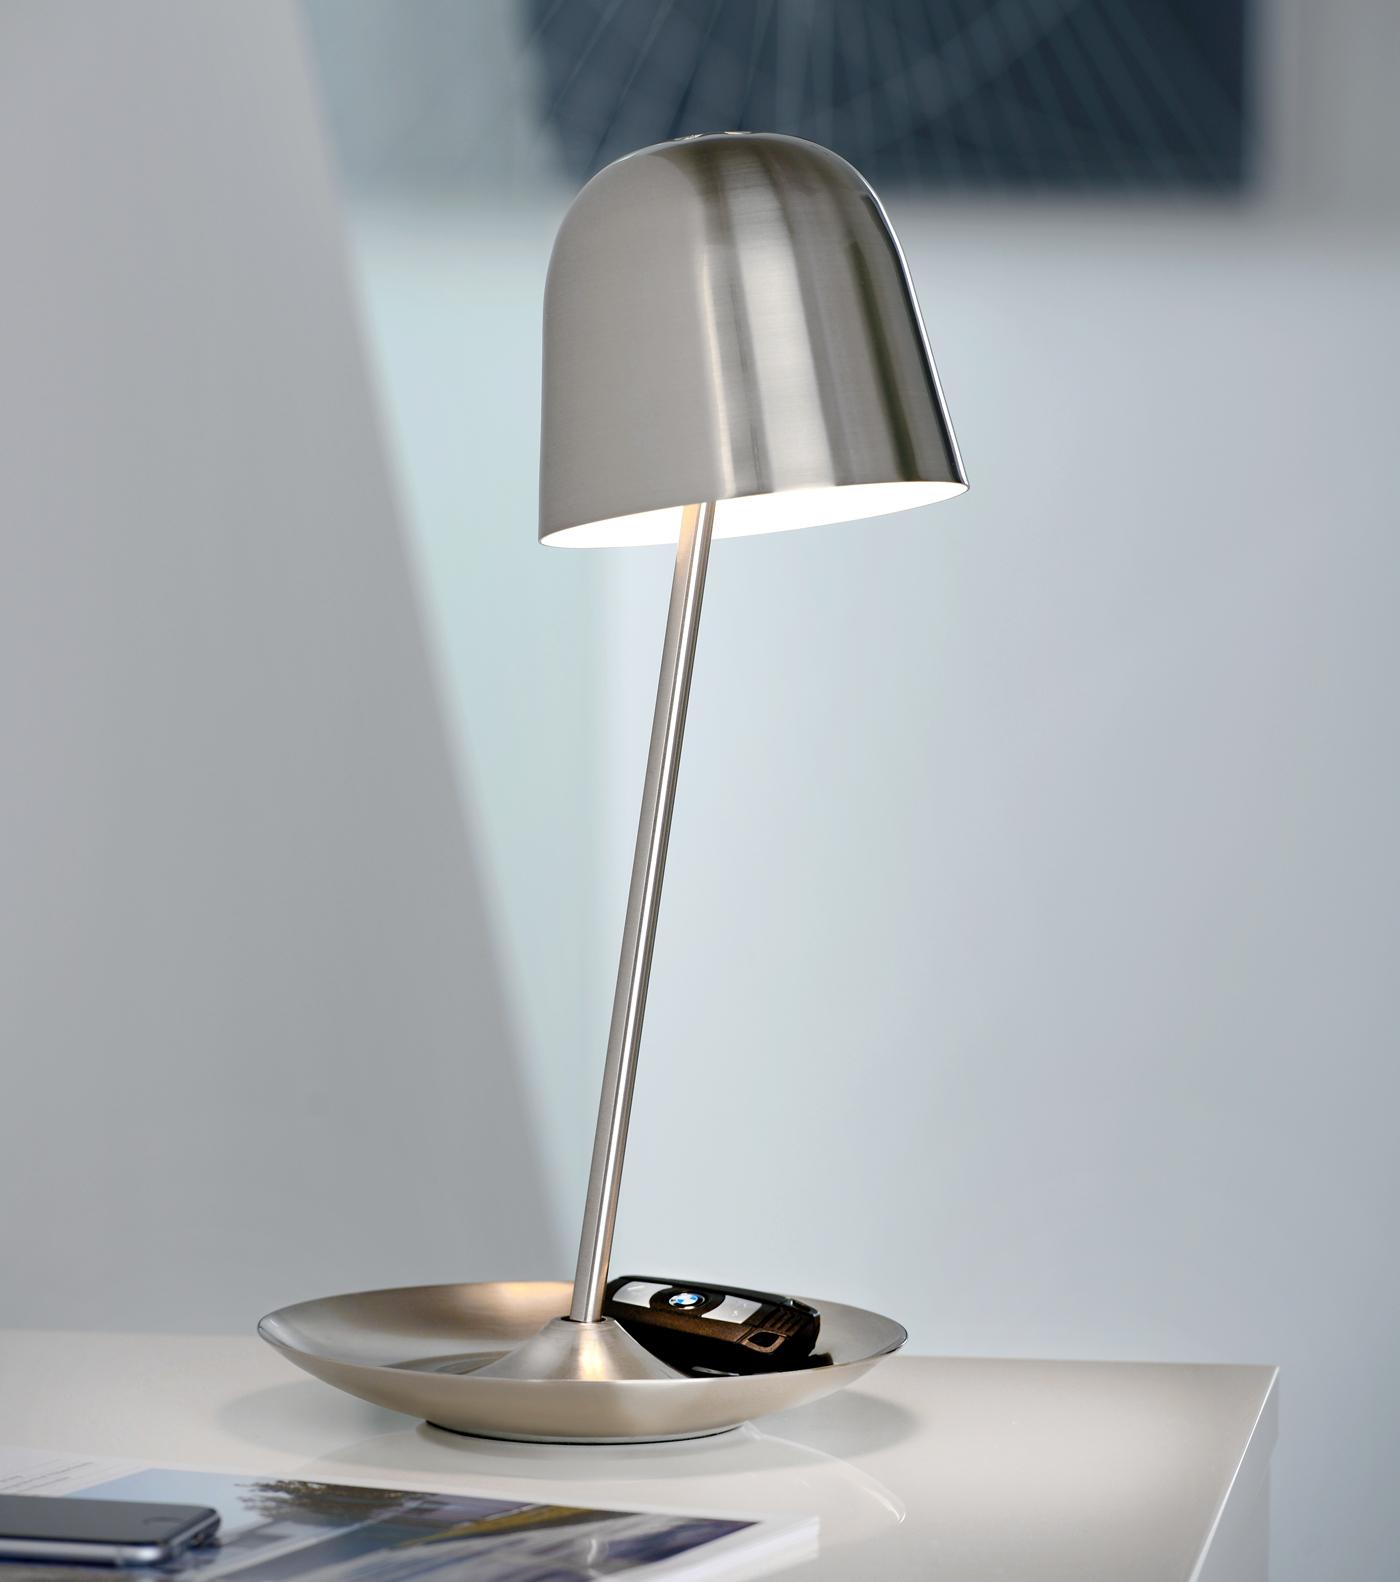 Fantastic Eduard Euwens Pirol Table Lamp Sompex 2013 2014 Interior Design Ideas Inesswwsoteloinfo